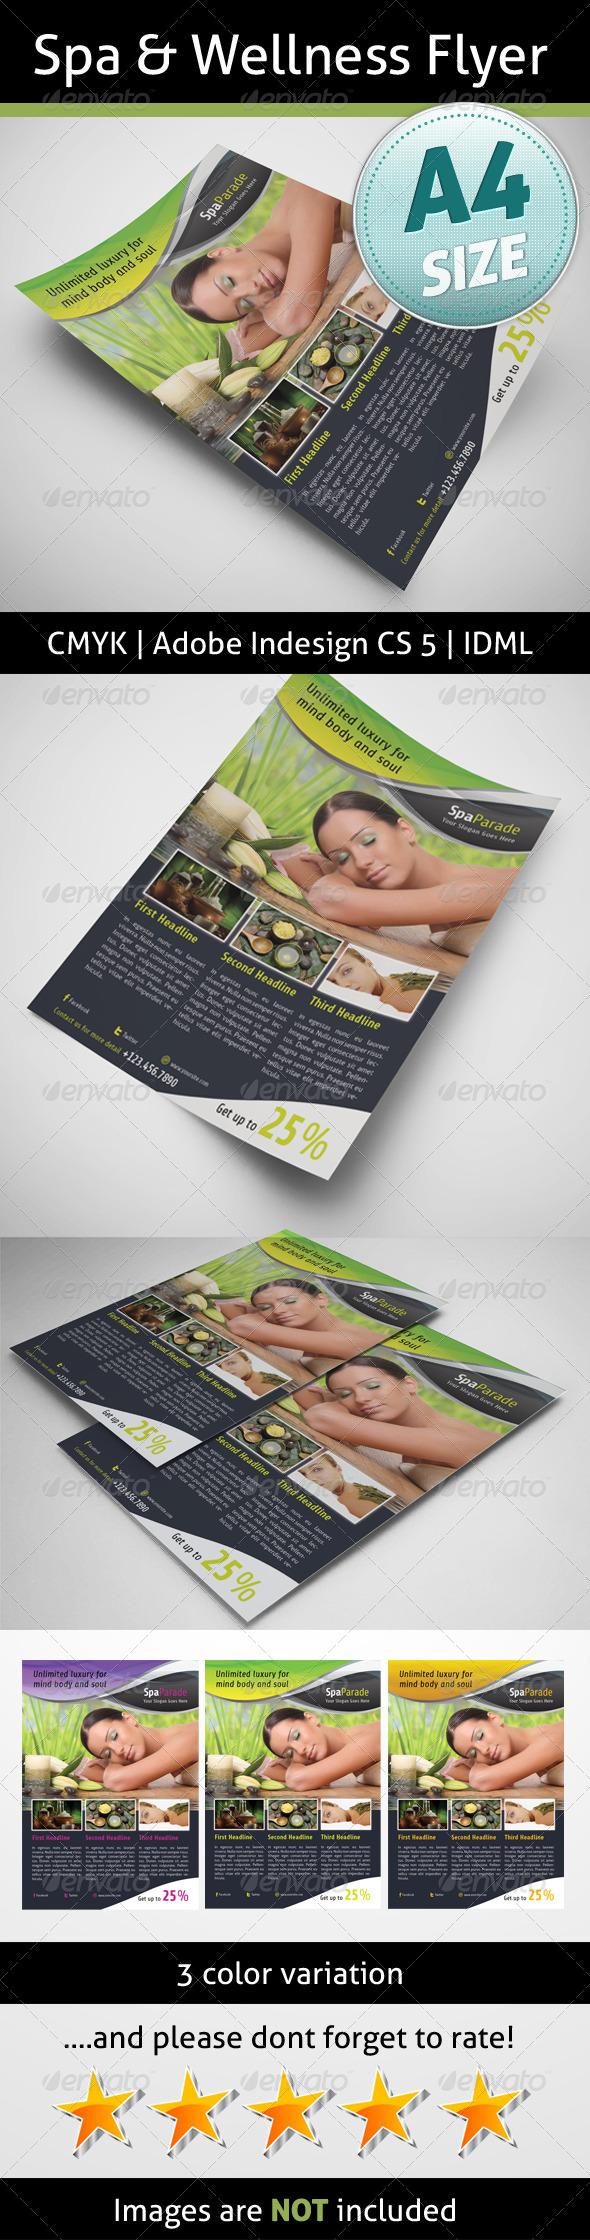 GraphicRiver Spa & Wellness Flyer 5181273